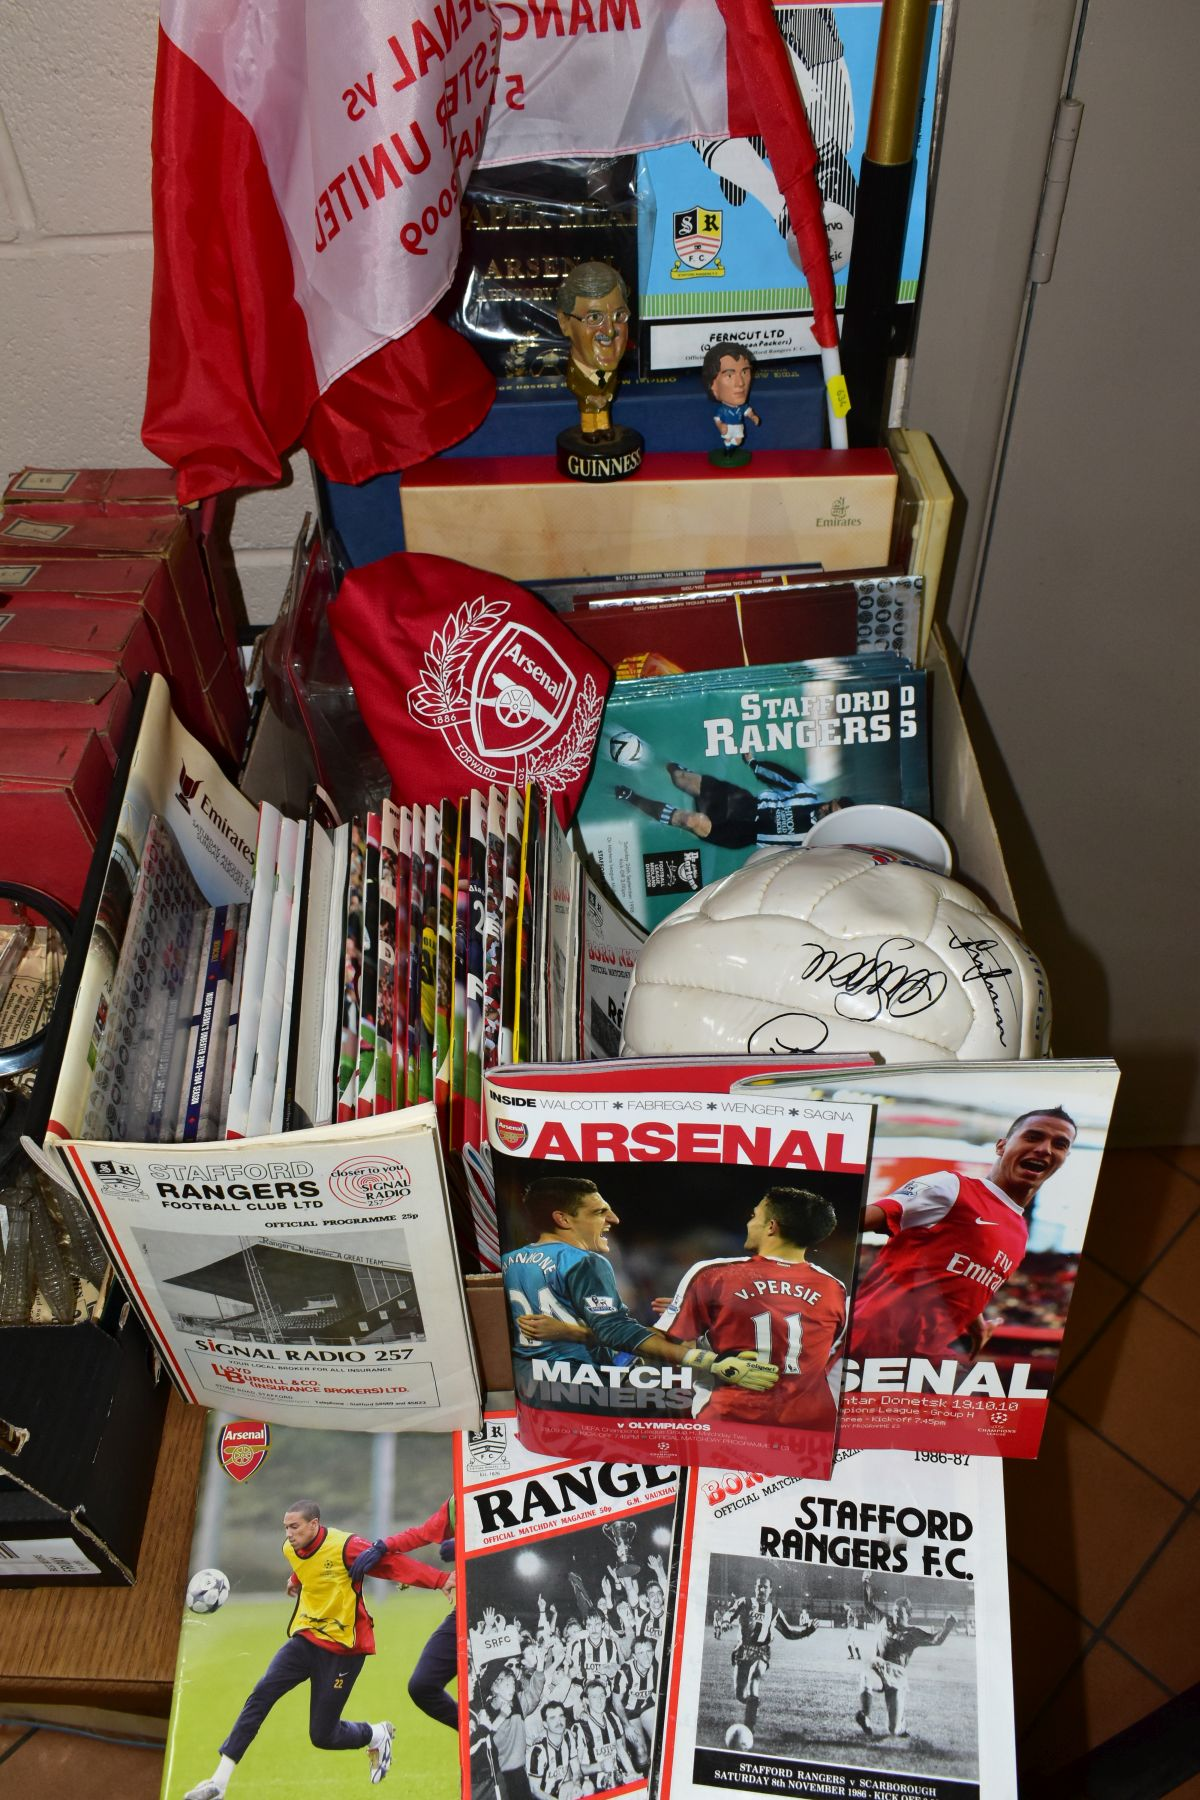 ARSENAL FOOTBALL CLUB MEMORABILIA to include a Football Ambassador book by Eddie Hapgood in a